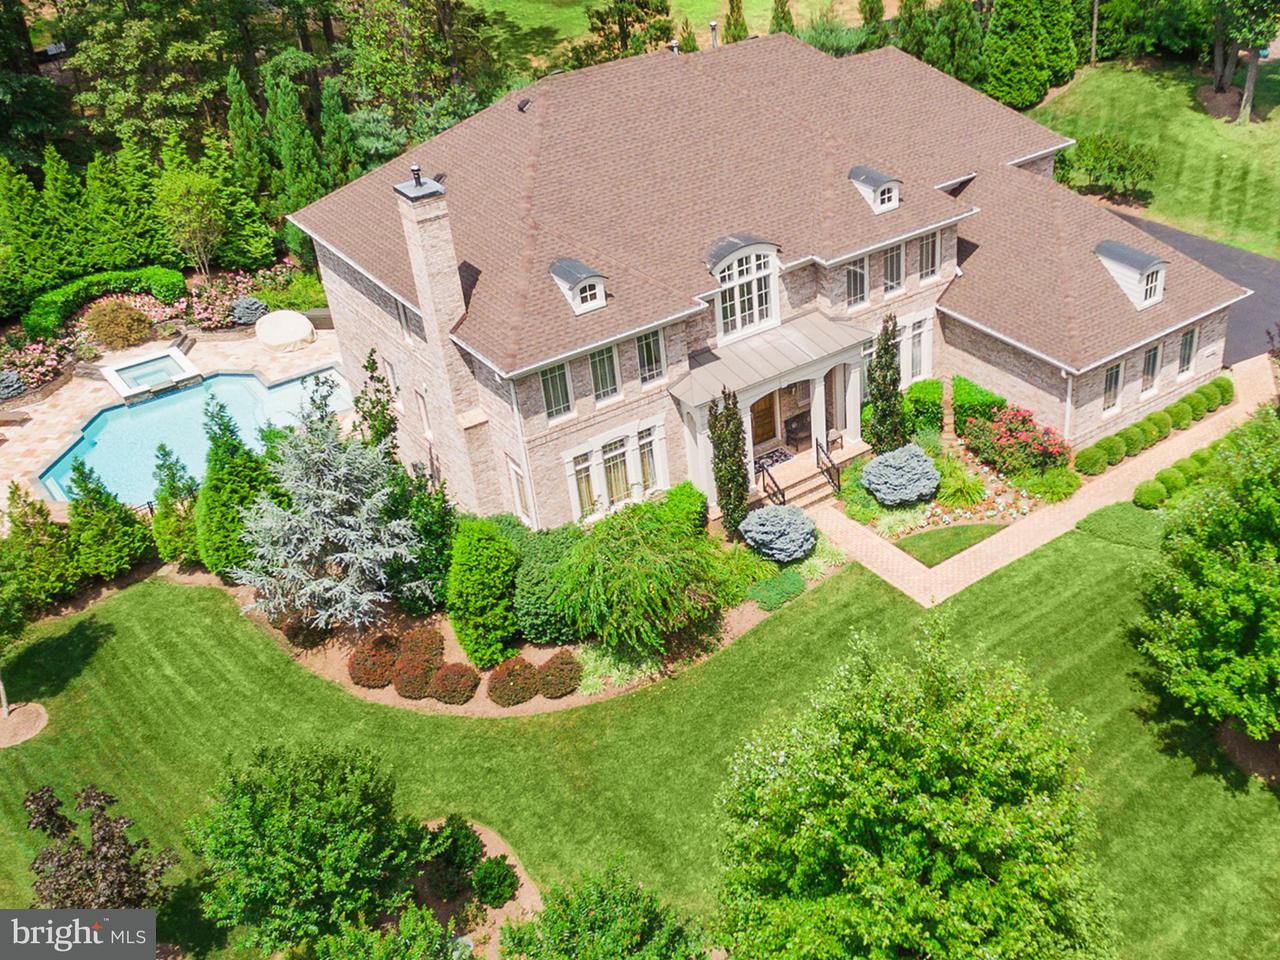 Single Family Home for Sale at 11196 Branton Lane 11196 Branton Lane Great Falls, Virginia 22066 United States